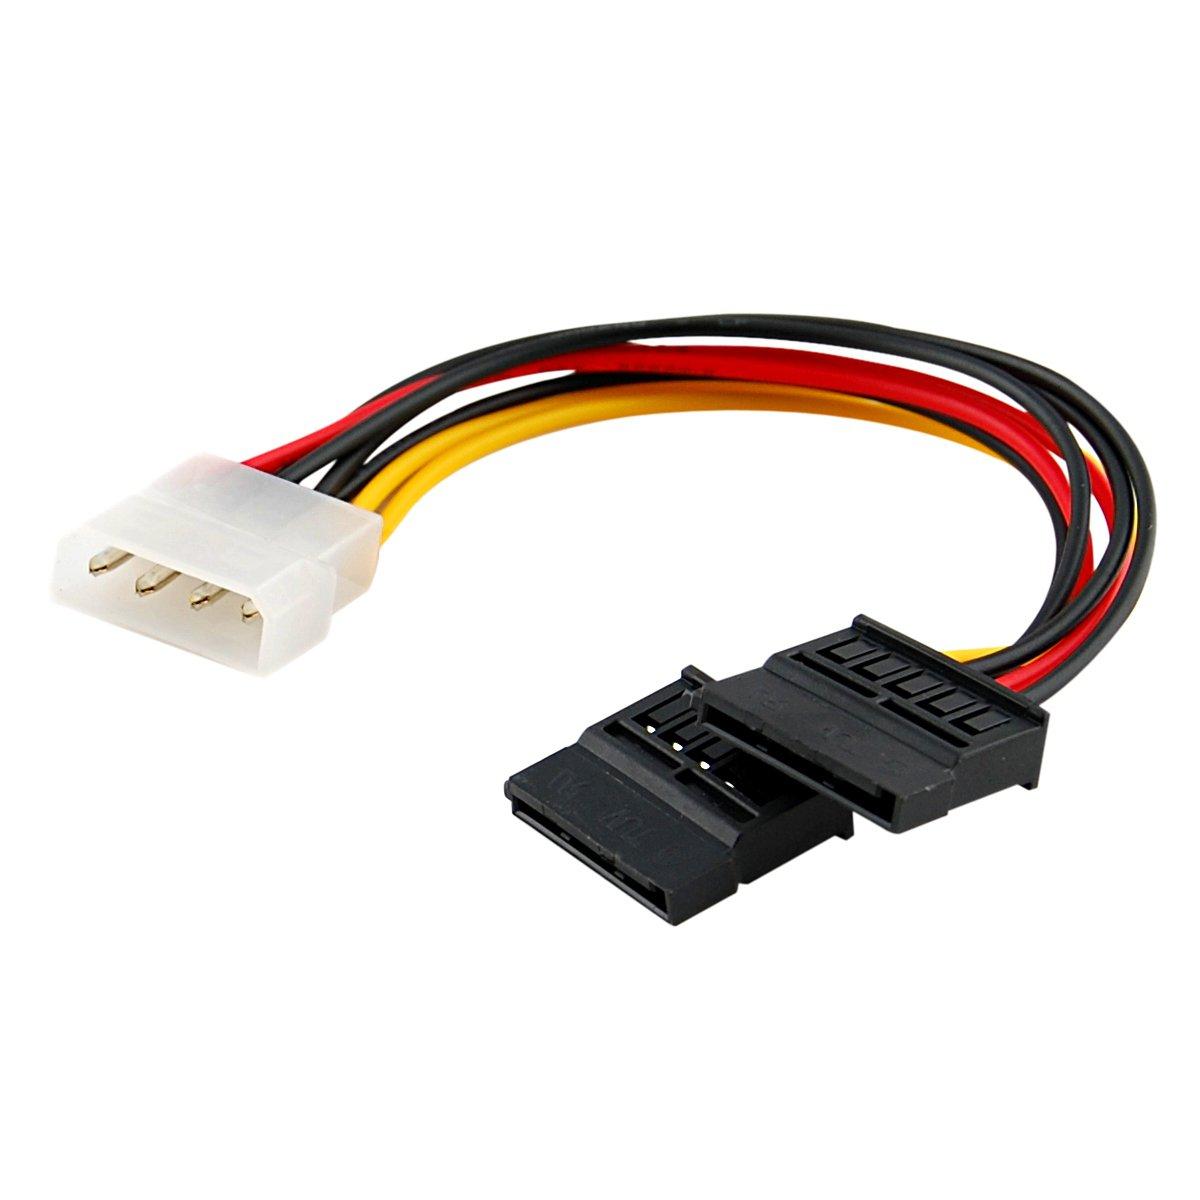 4 Pin Molex Power to Dual Serial ATA (SATA) Power Adapter